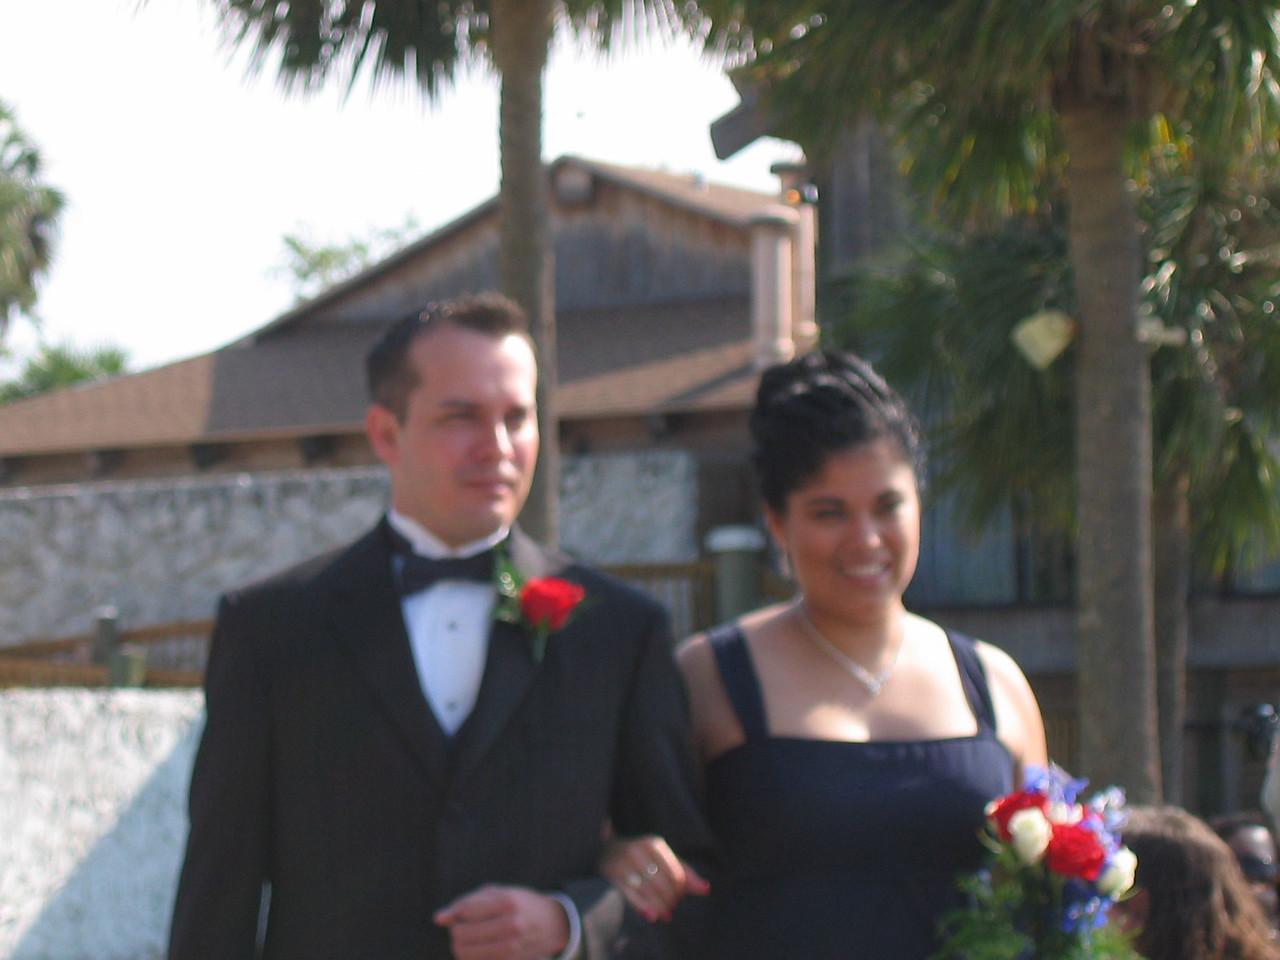 Doug Dietz and Tamara Barrios